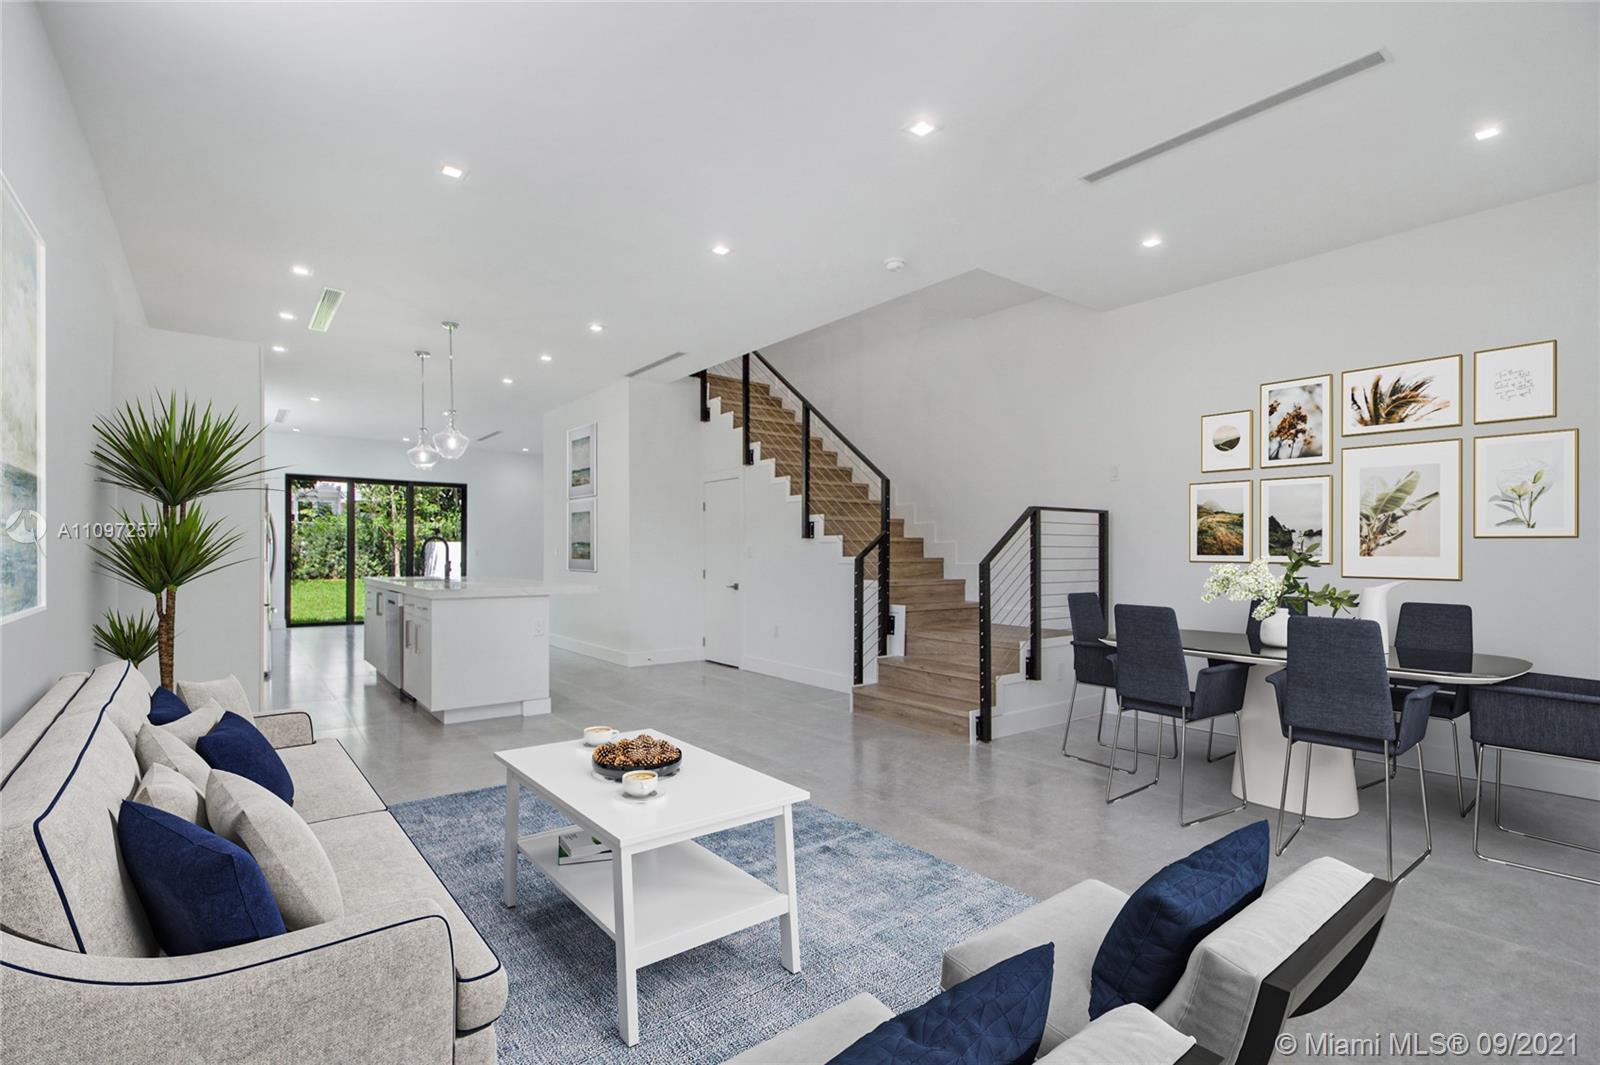 Urban Villas by Coconut Gr Condo,For Sale,Urban Villas by Coconut Gr Brickell,realty,broker,condos near me